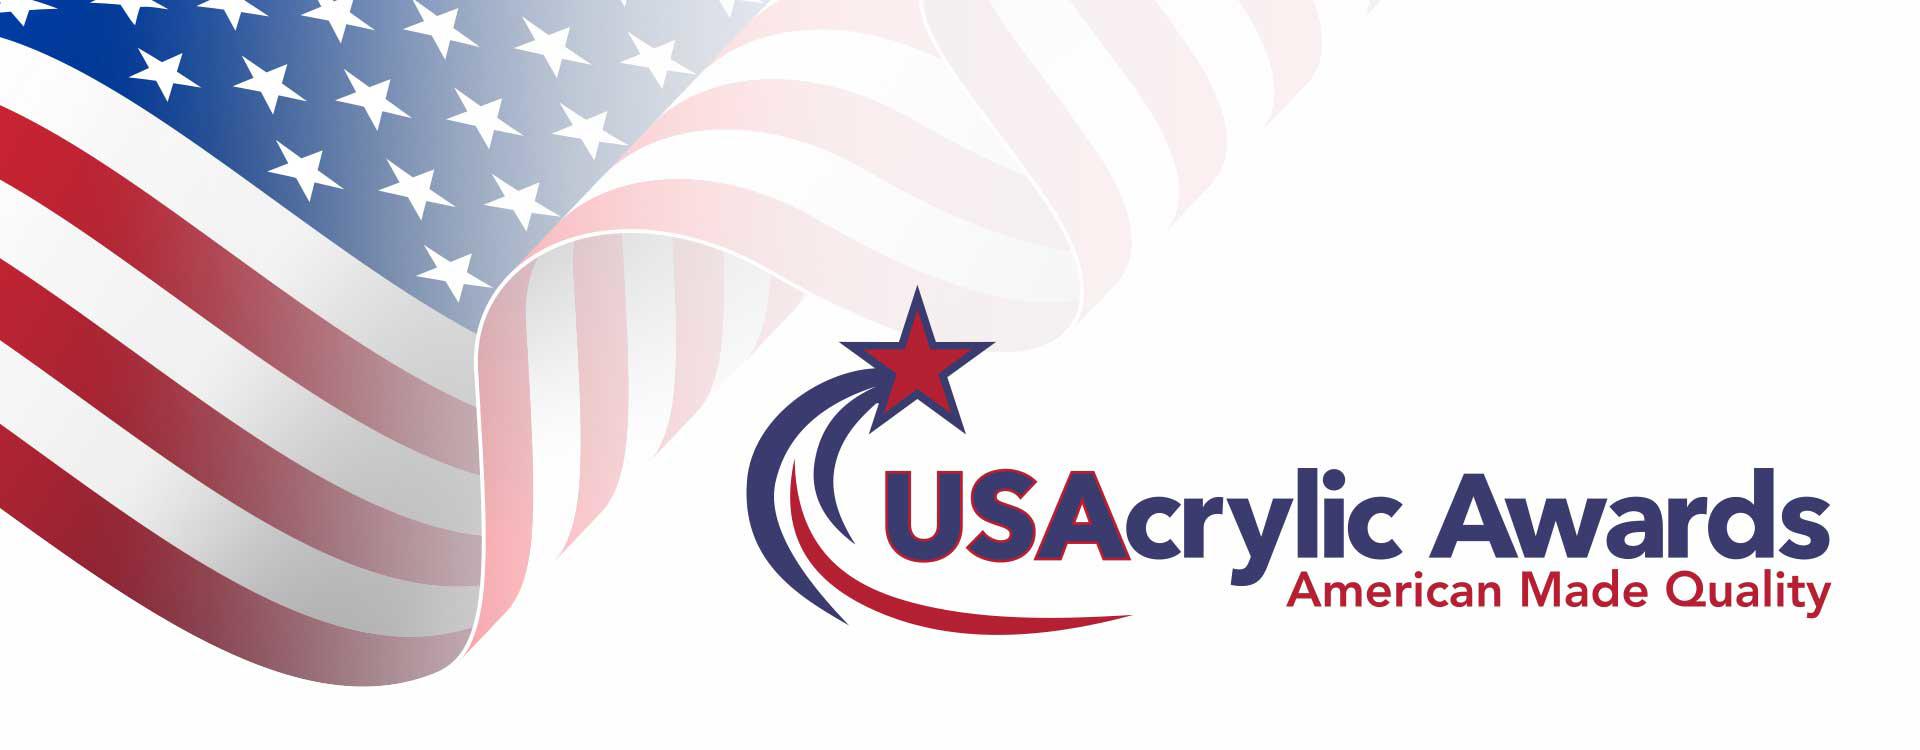 Waving American flag with US Acrylic Awards logo